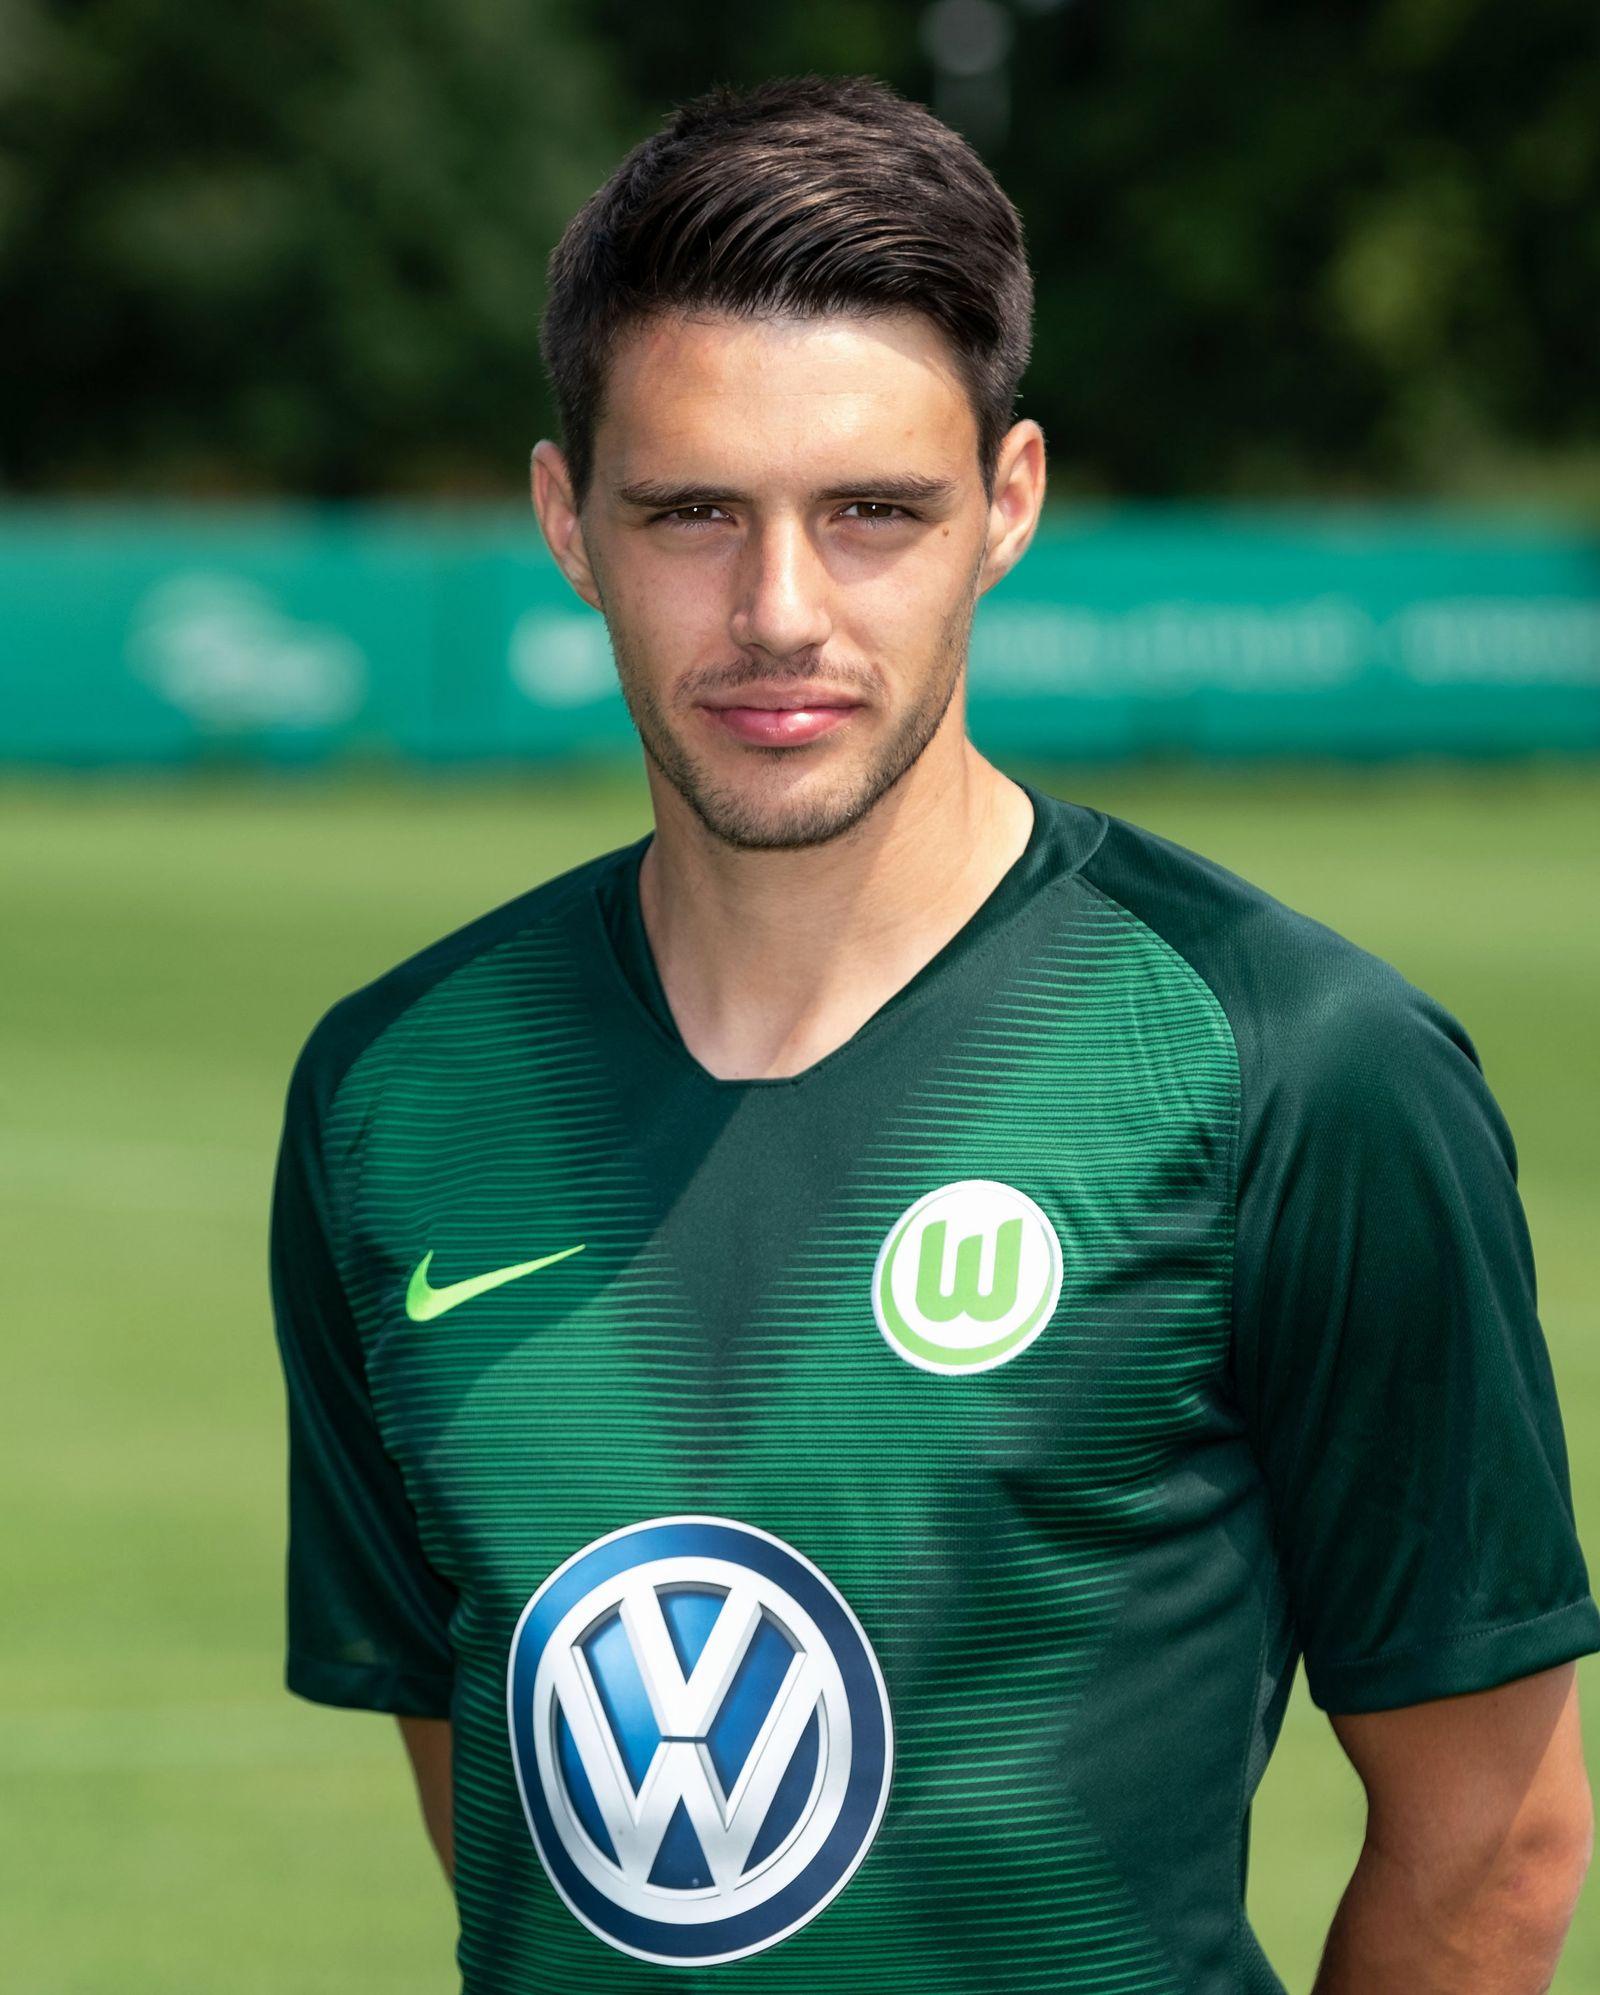 VfLWolfsburg ist Trikotmeister